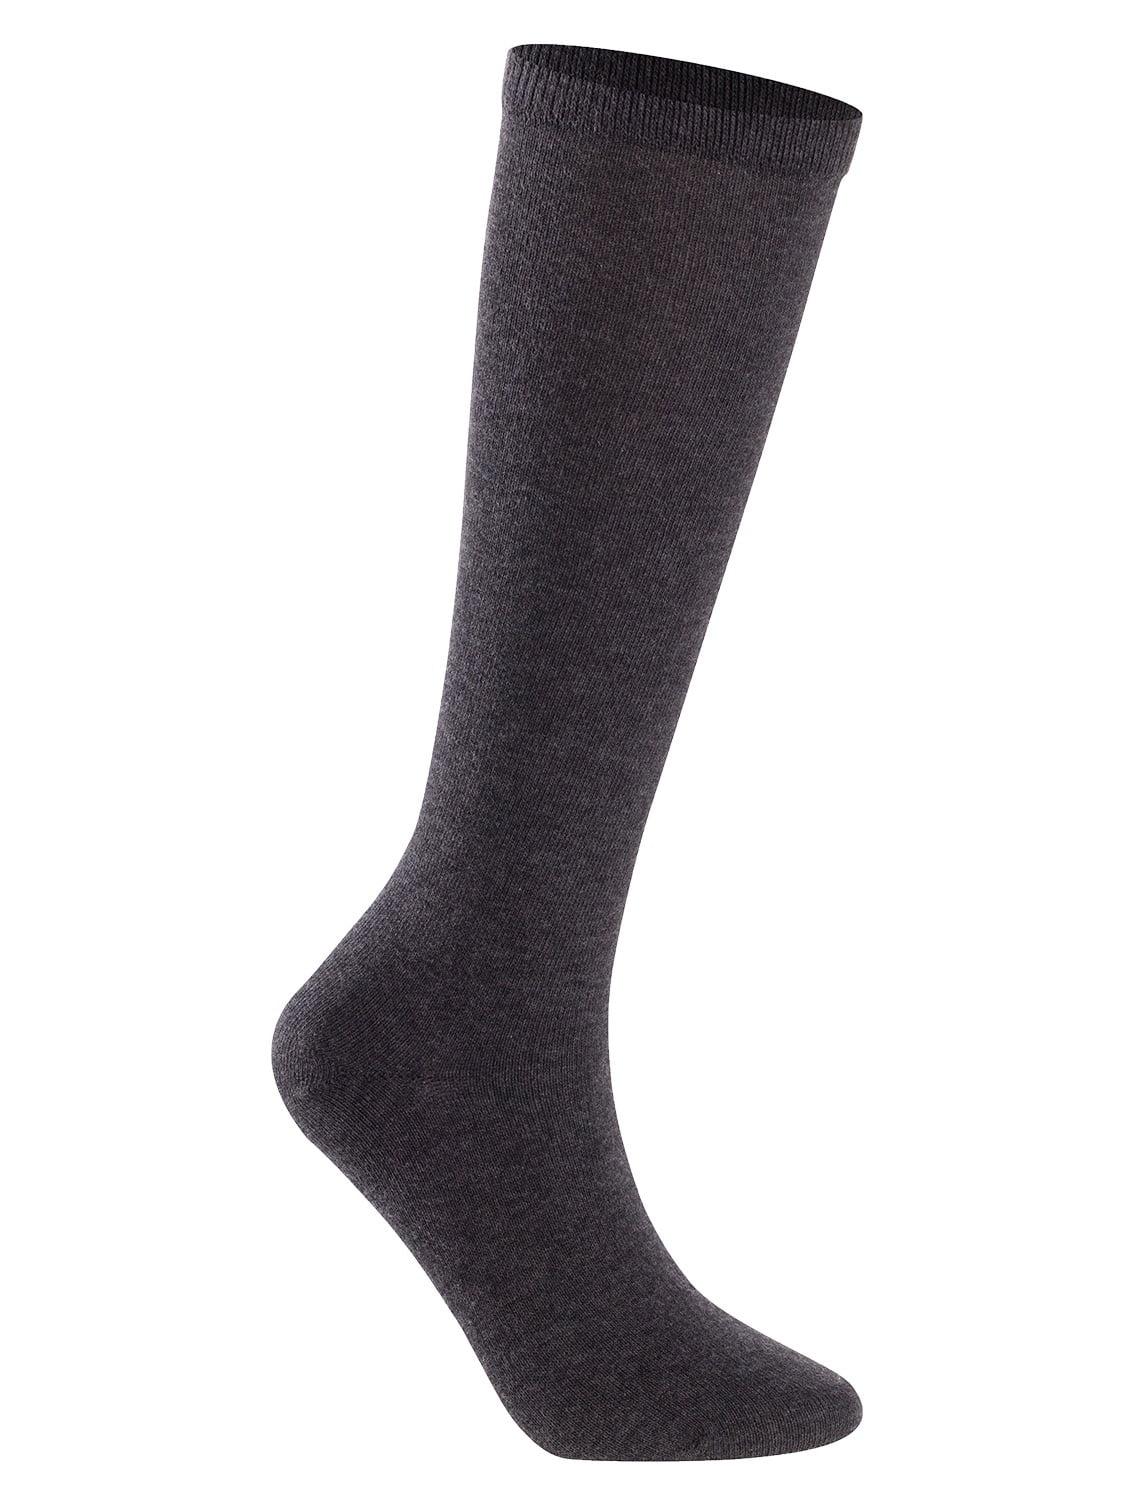 Lian LifeStyle Unisex Children 4 Pairs High Crew Combed Cotton Socks Large (12Y-15Y) Dark Grey